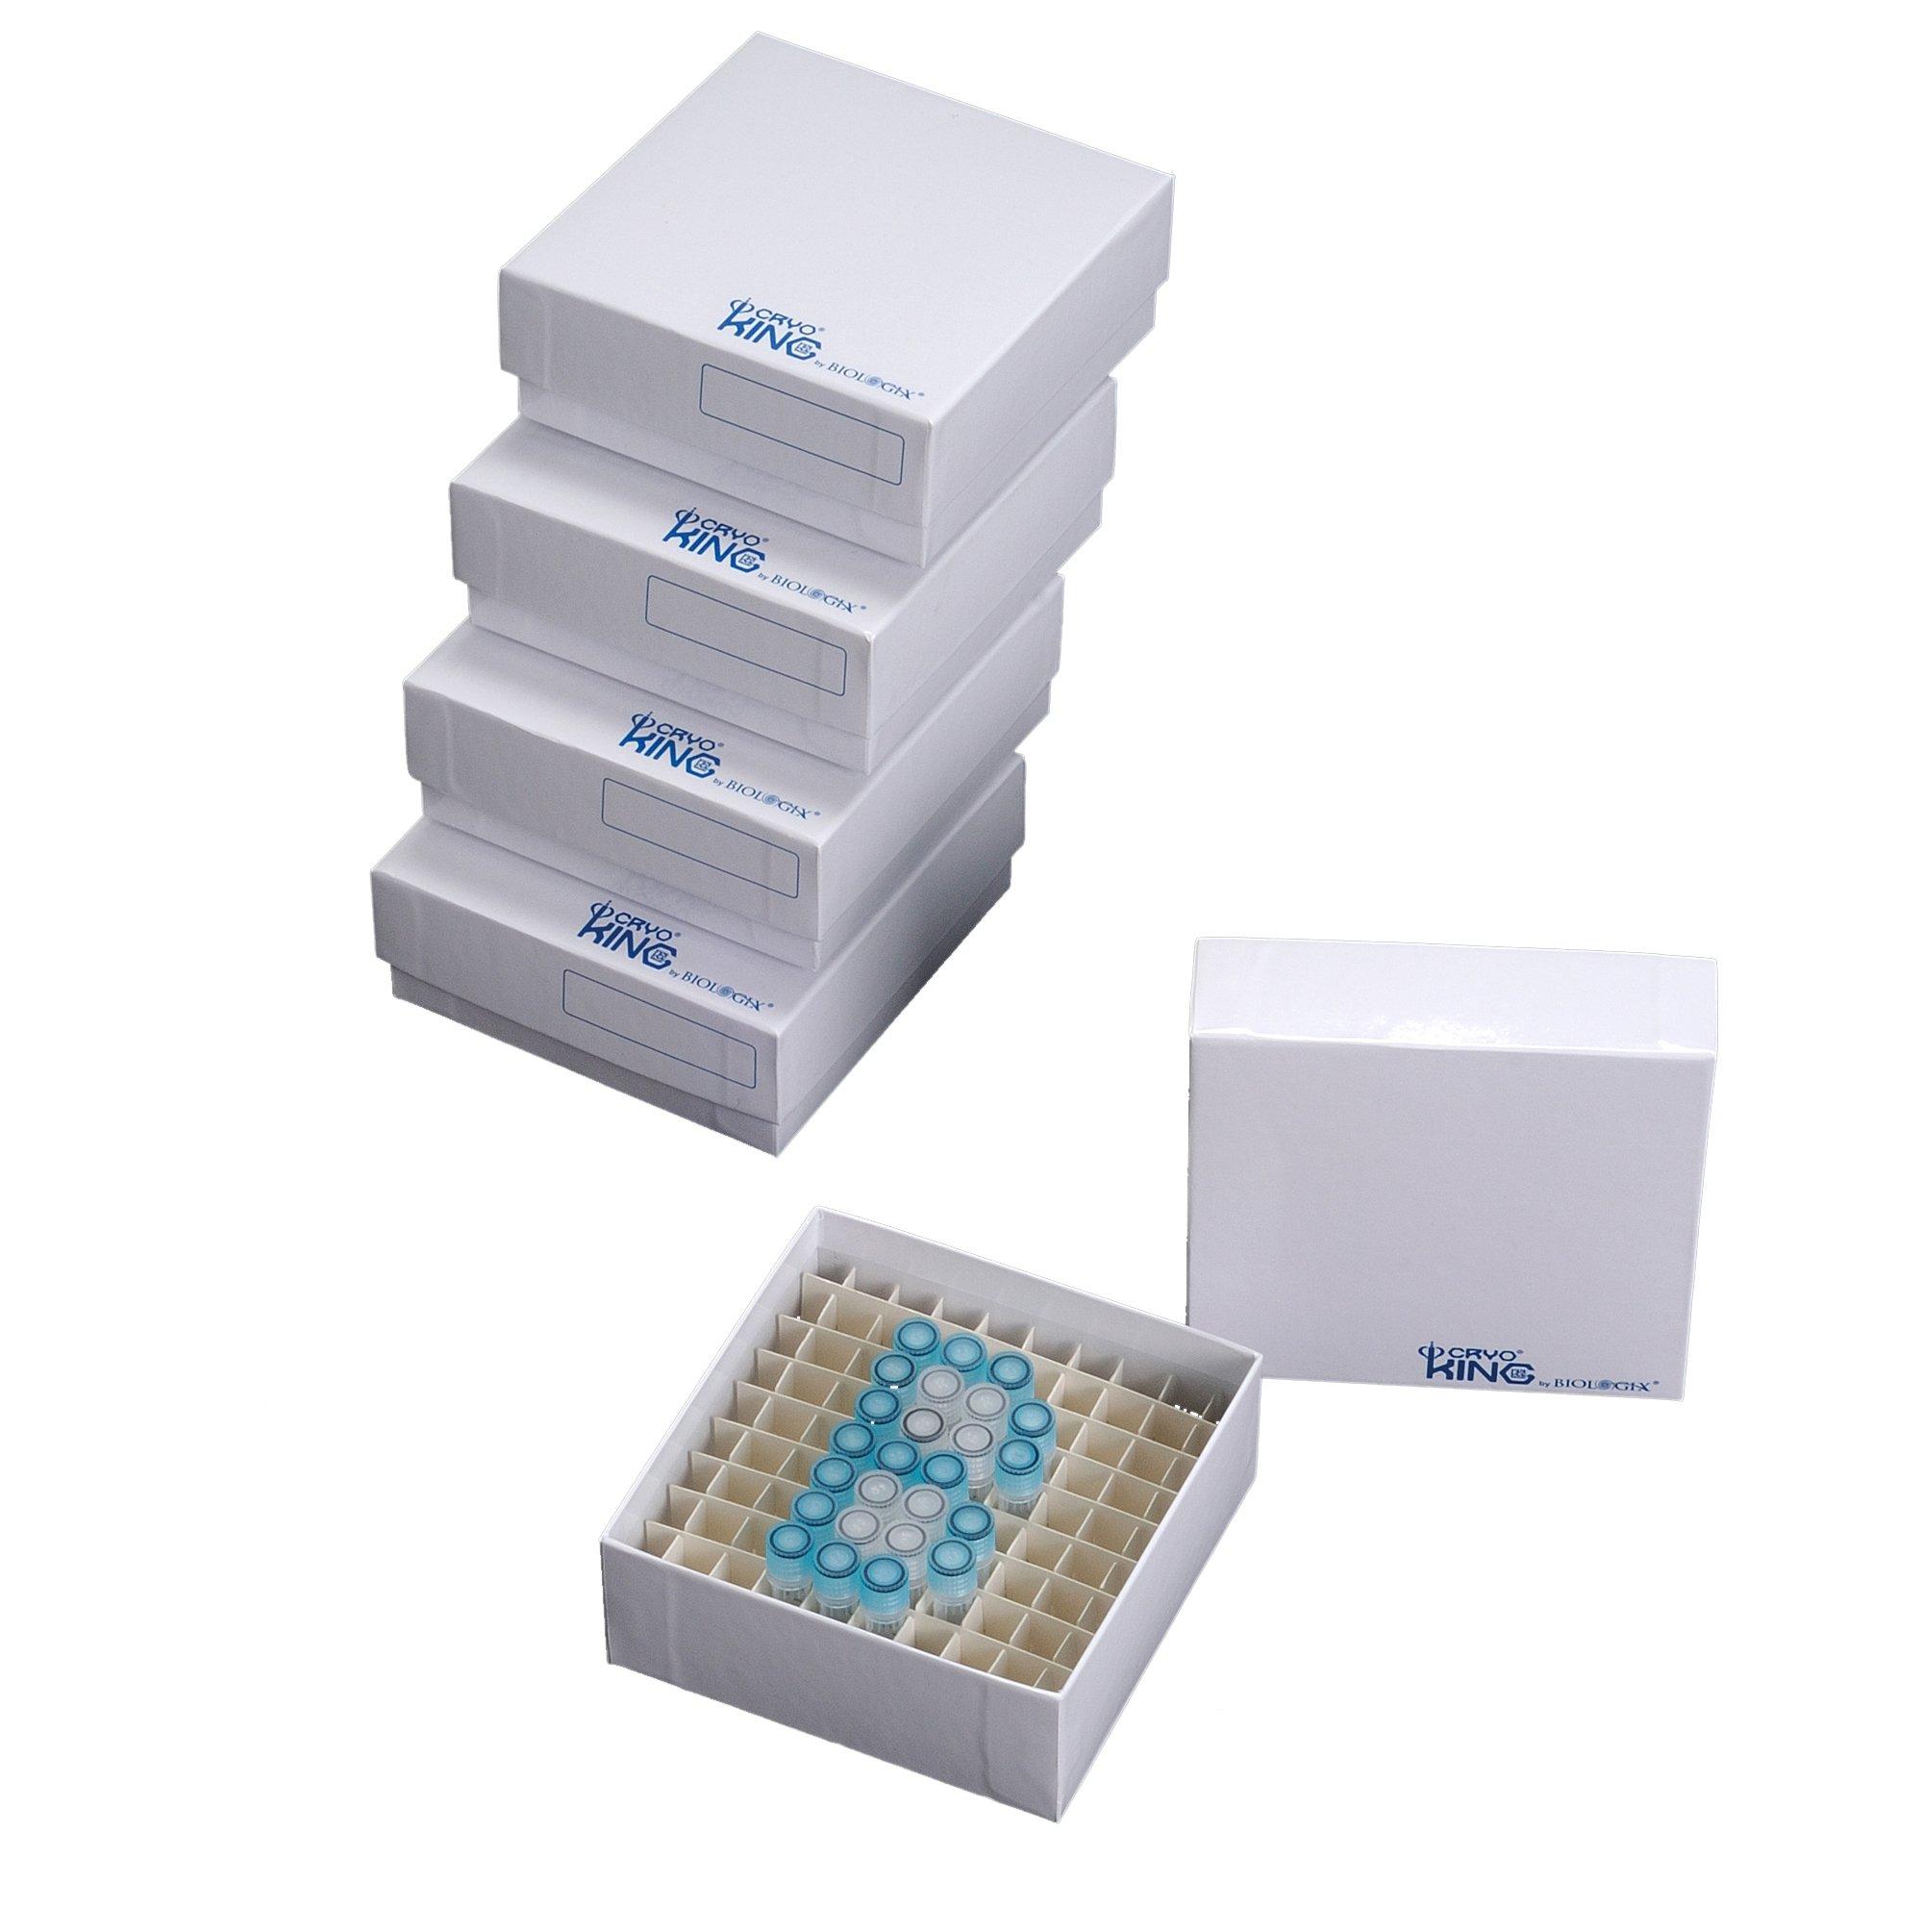 Biologix 90-1281 Cardboard Microcentrifuge Tube Freezer Storage Box, 2'' Height, 81 Places (Case of 100)